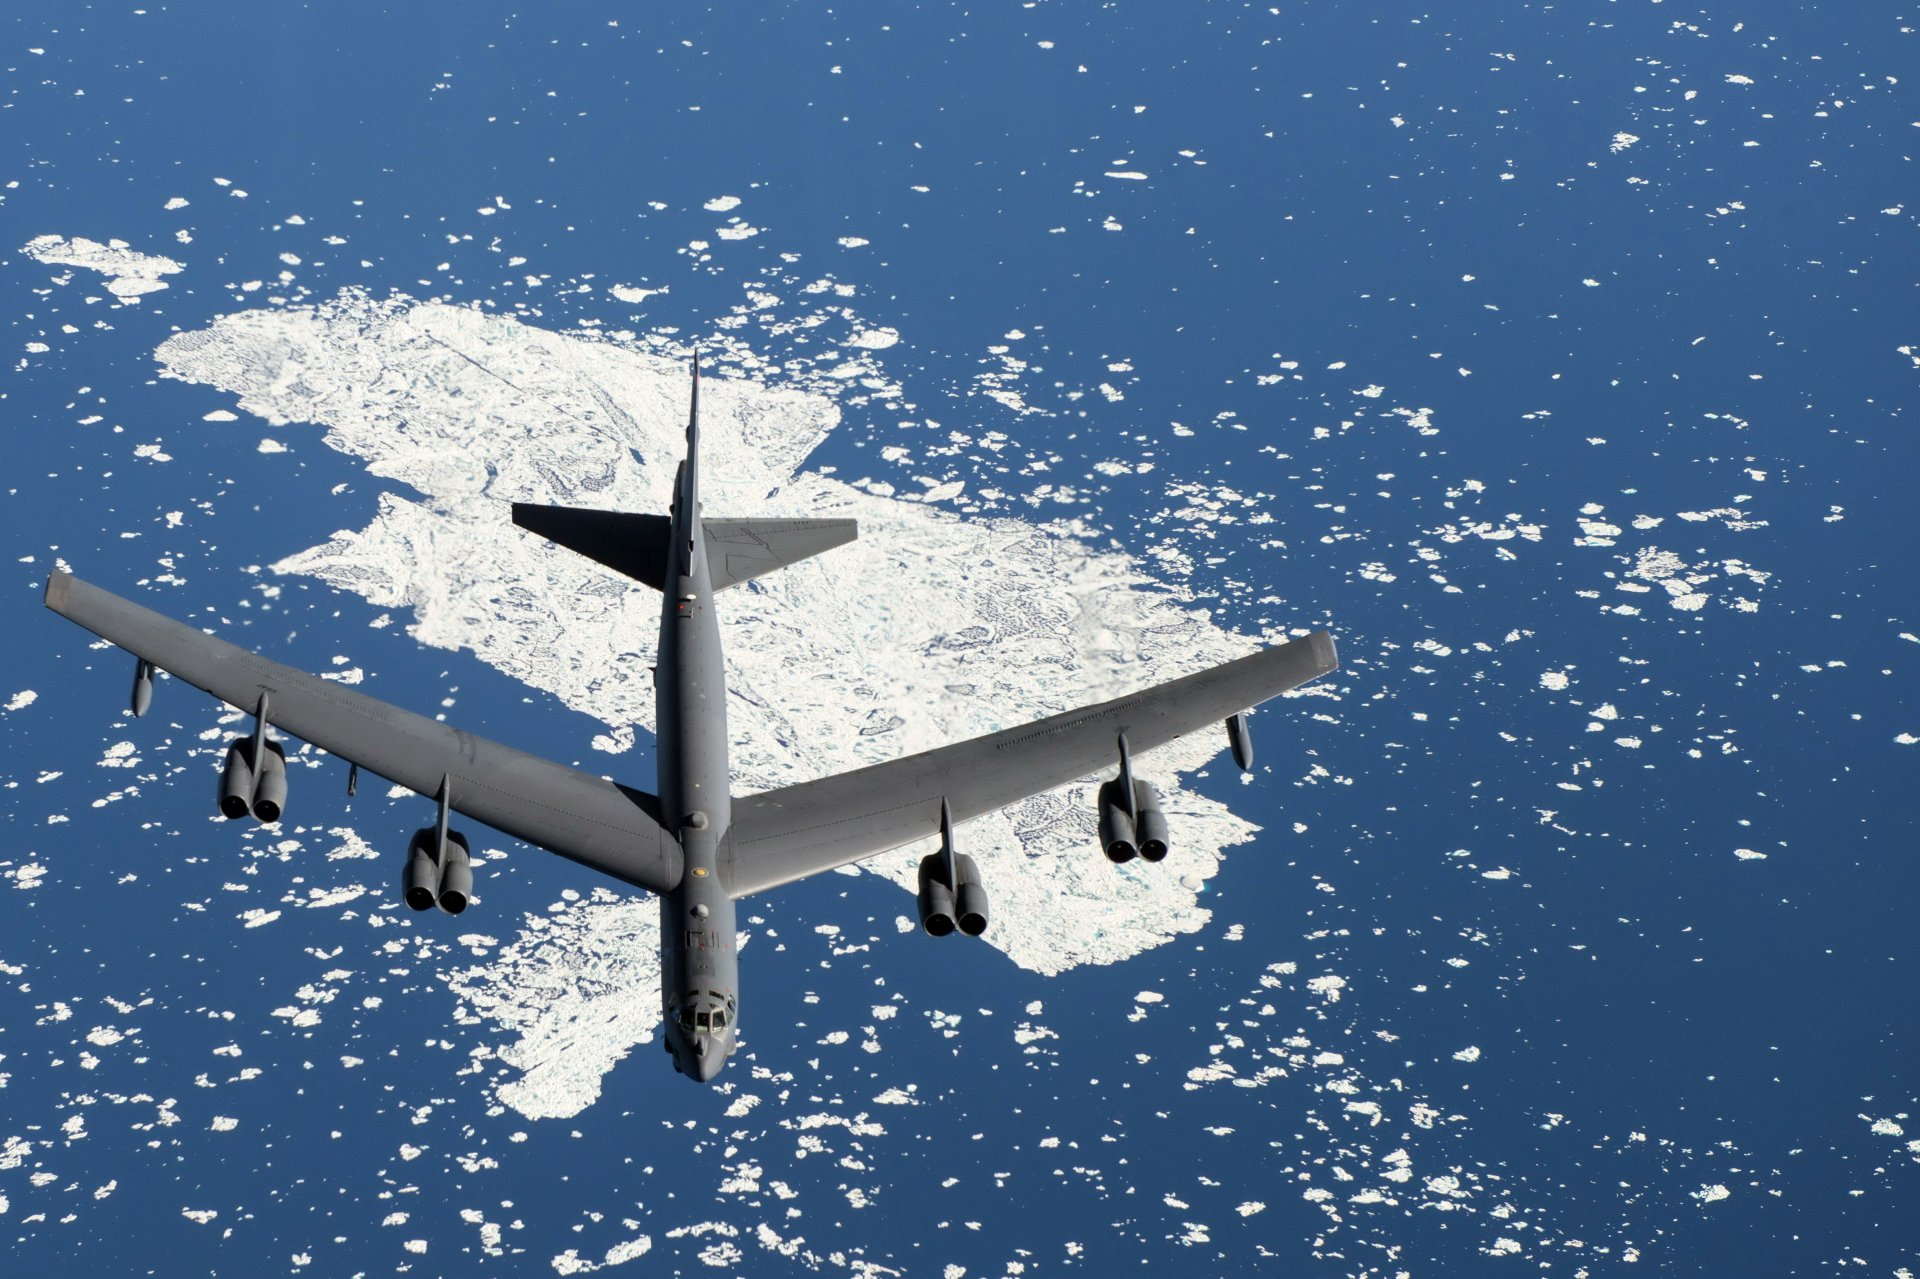 Military - Boeing B-52 Stratofortress  Aircraft Warplane Bomber Air Force Airplane Military Wallpaper